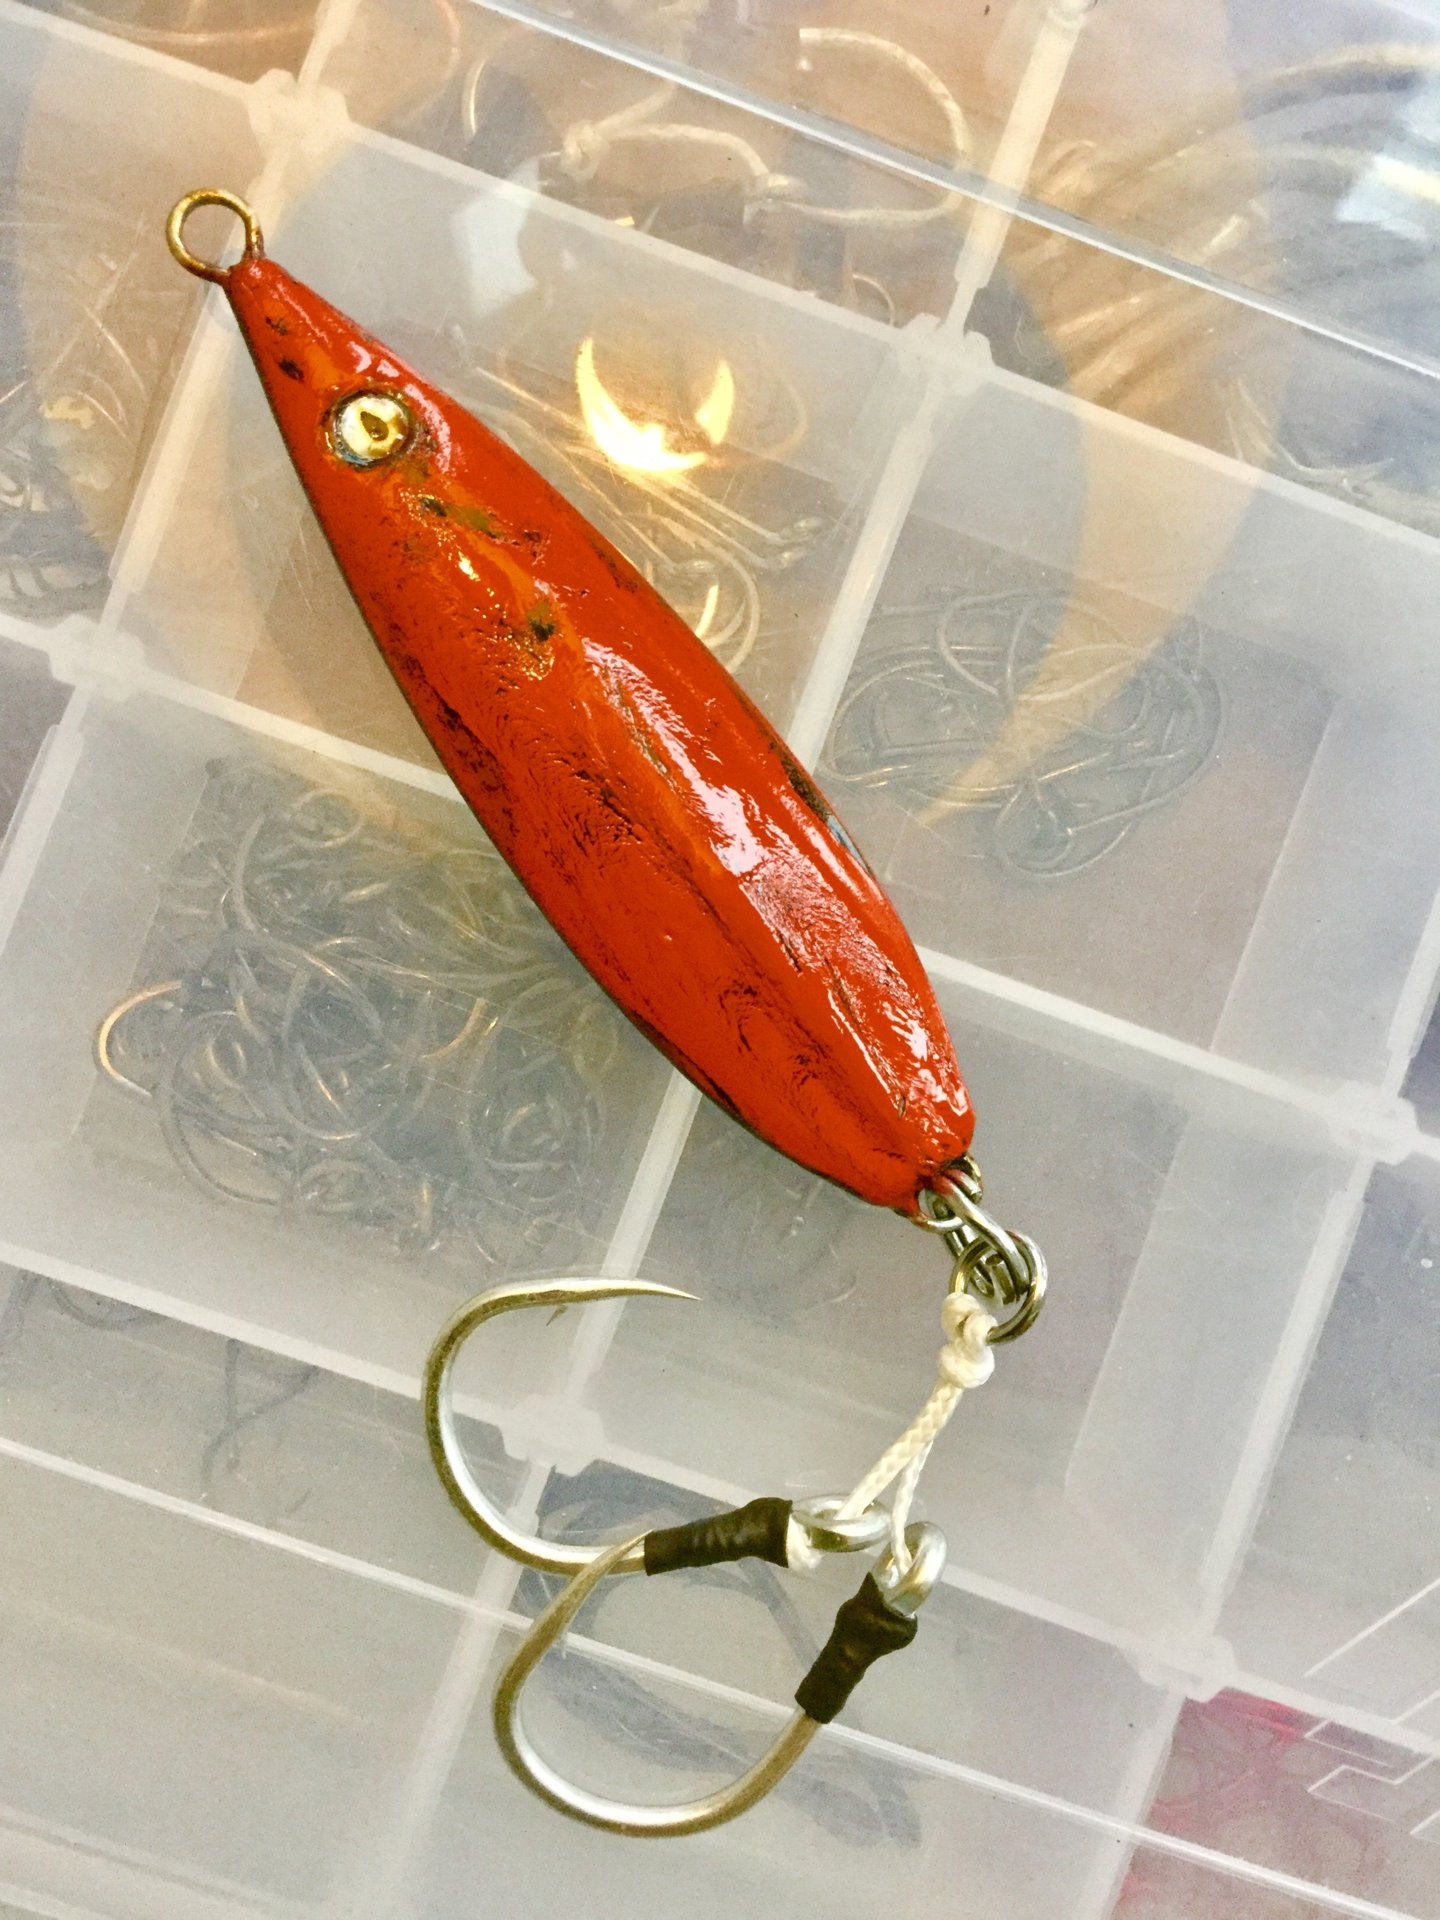 Introducing The Pelagic Red Crab Flat Fall Bloodydecks